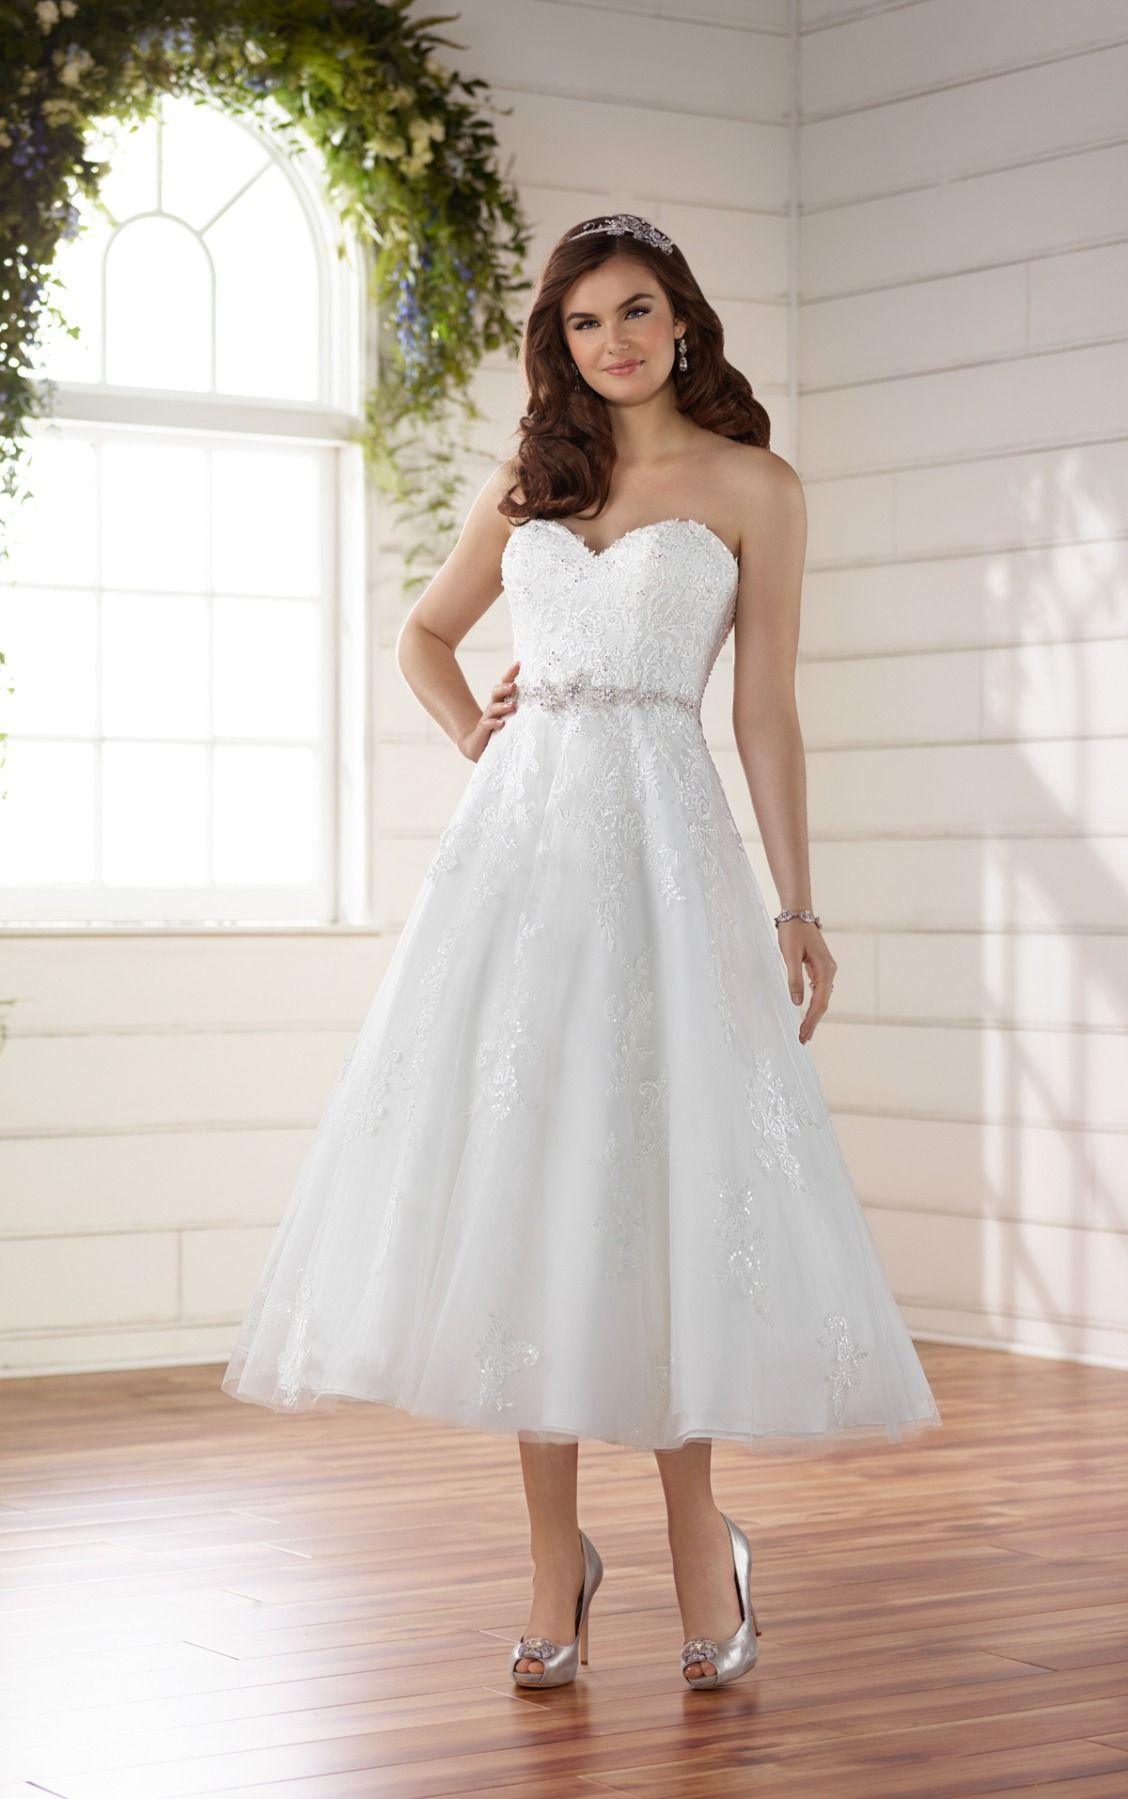 Tea Length Wedding Dress with Subtle Shimmer Essense of